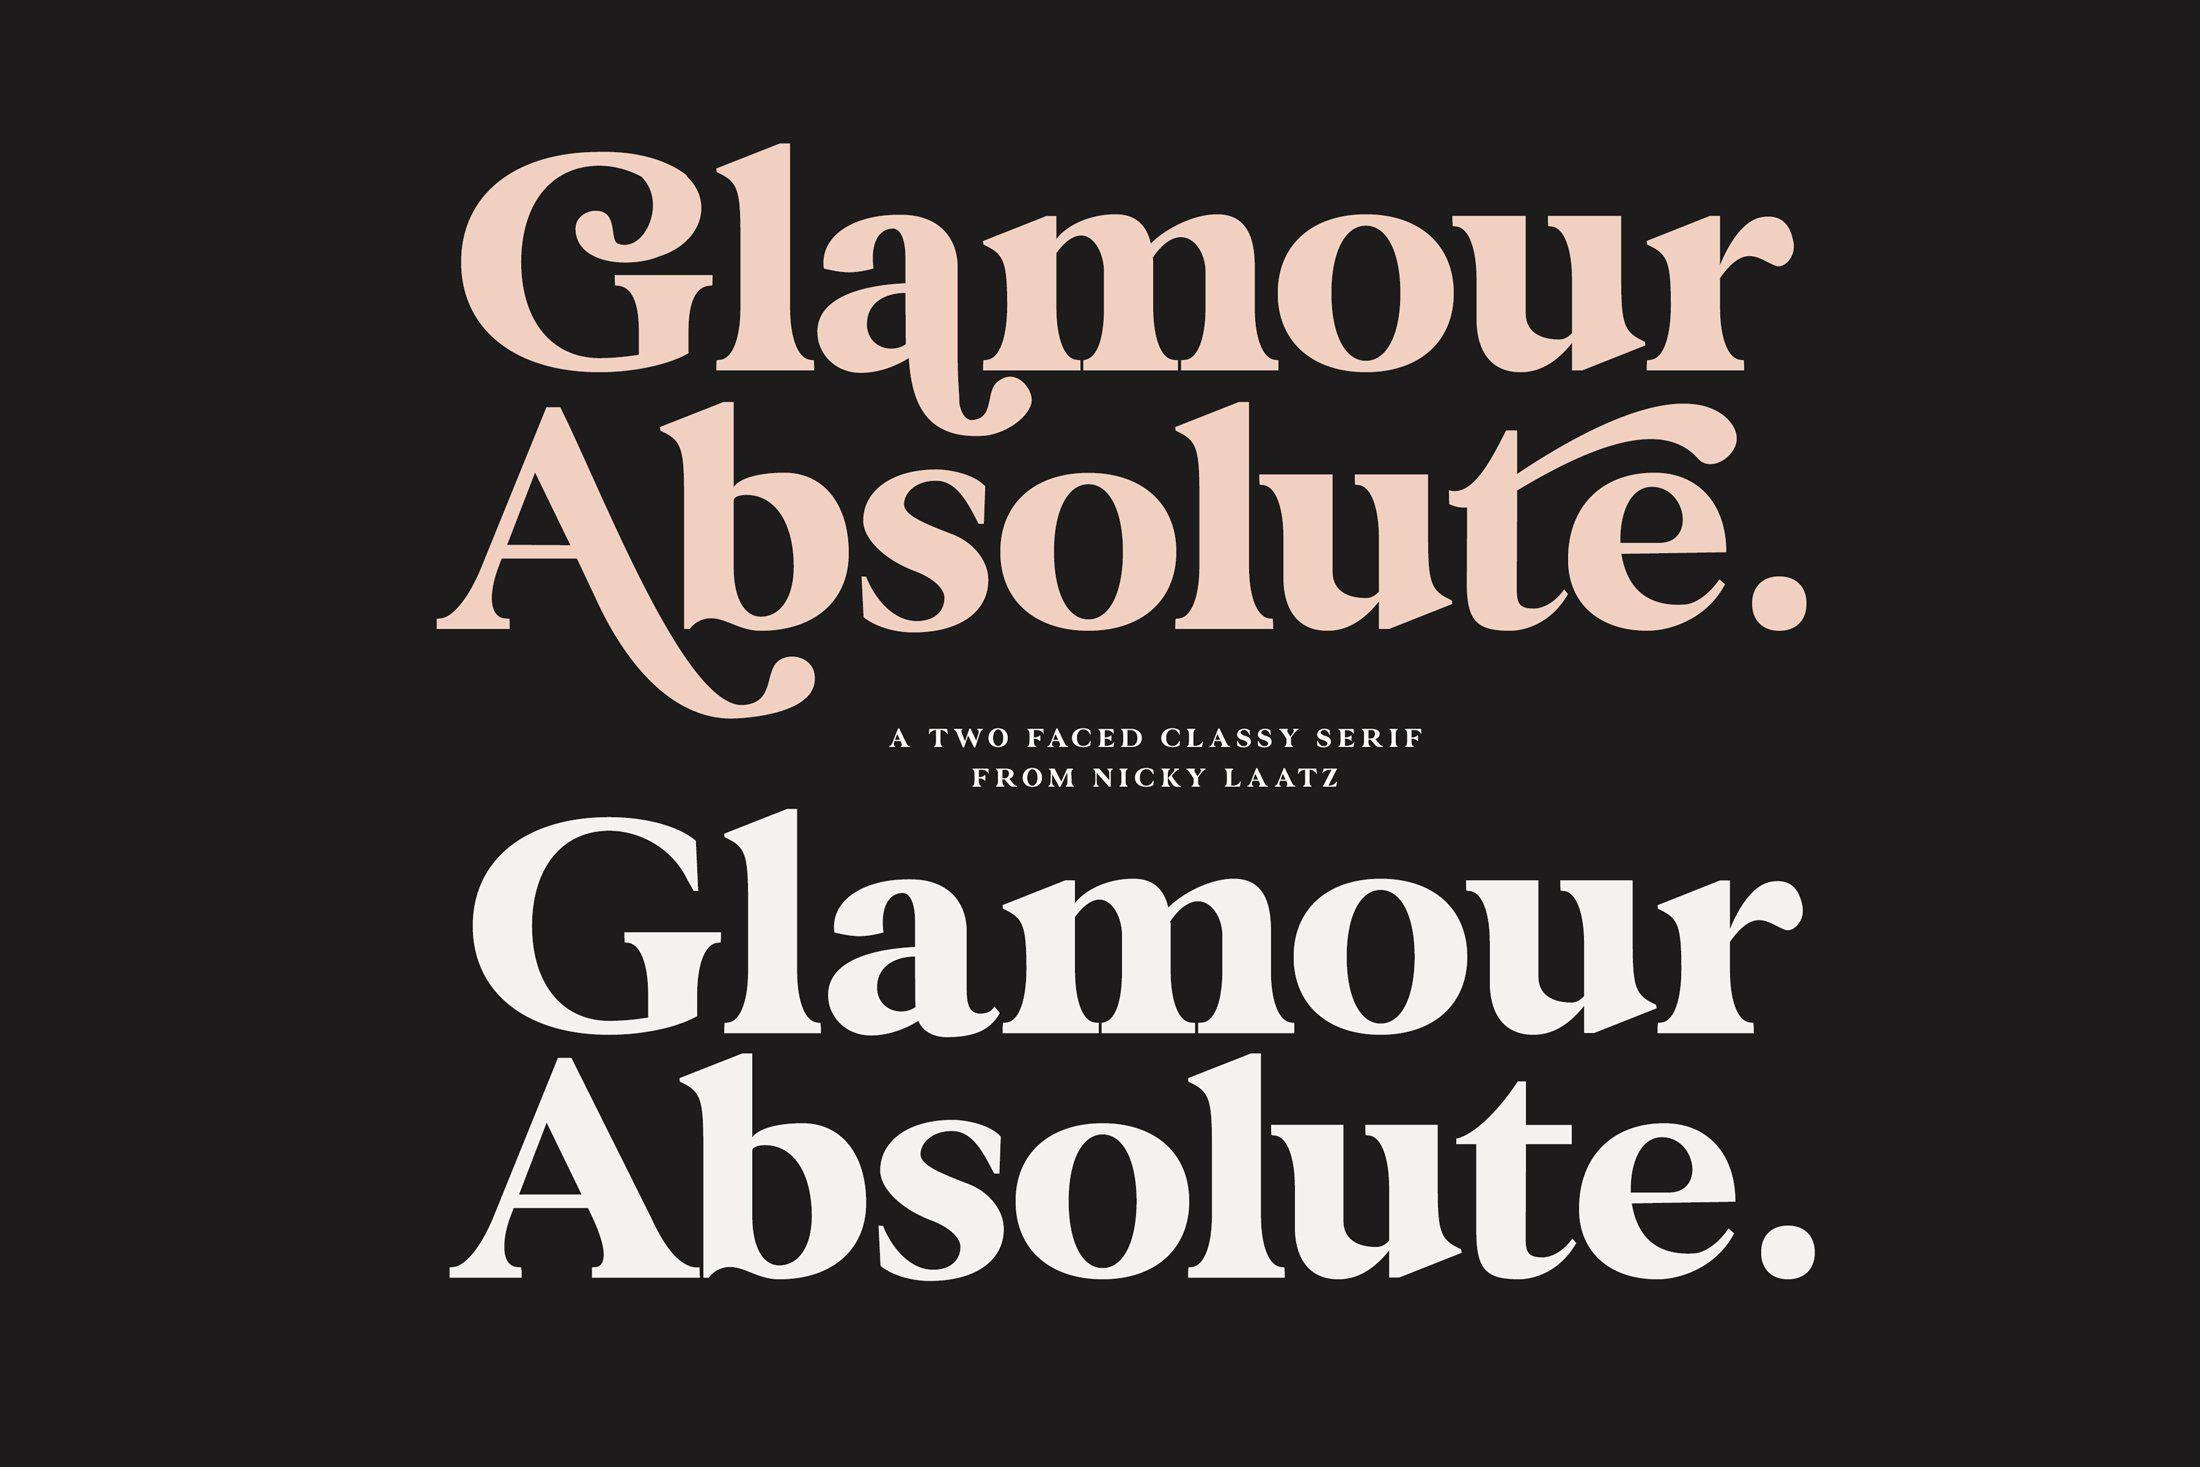 Glamour Absolute Modern Vintage Font In 2020 Vintage Fonts Lettering Glamour